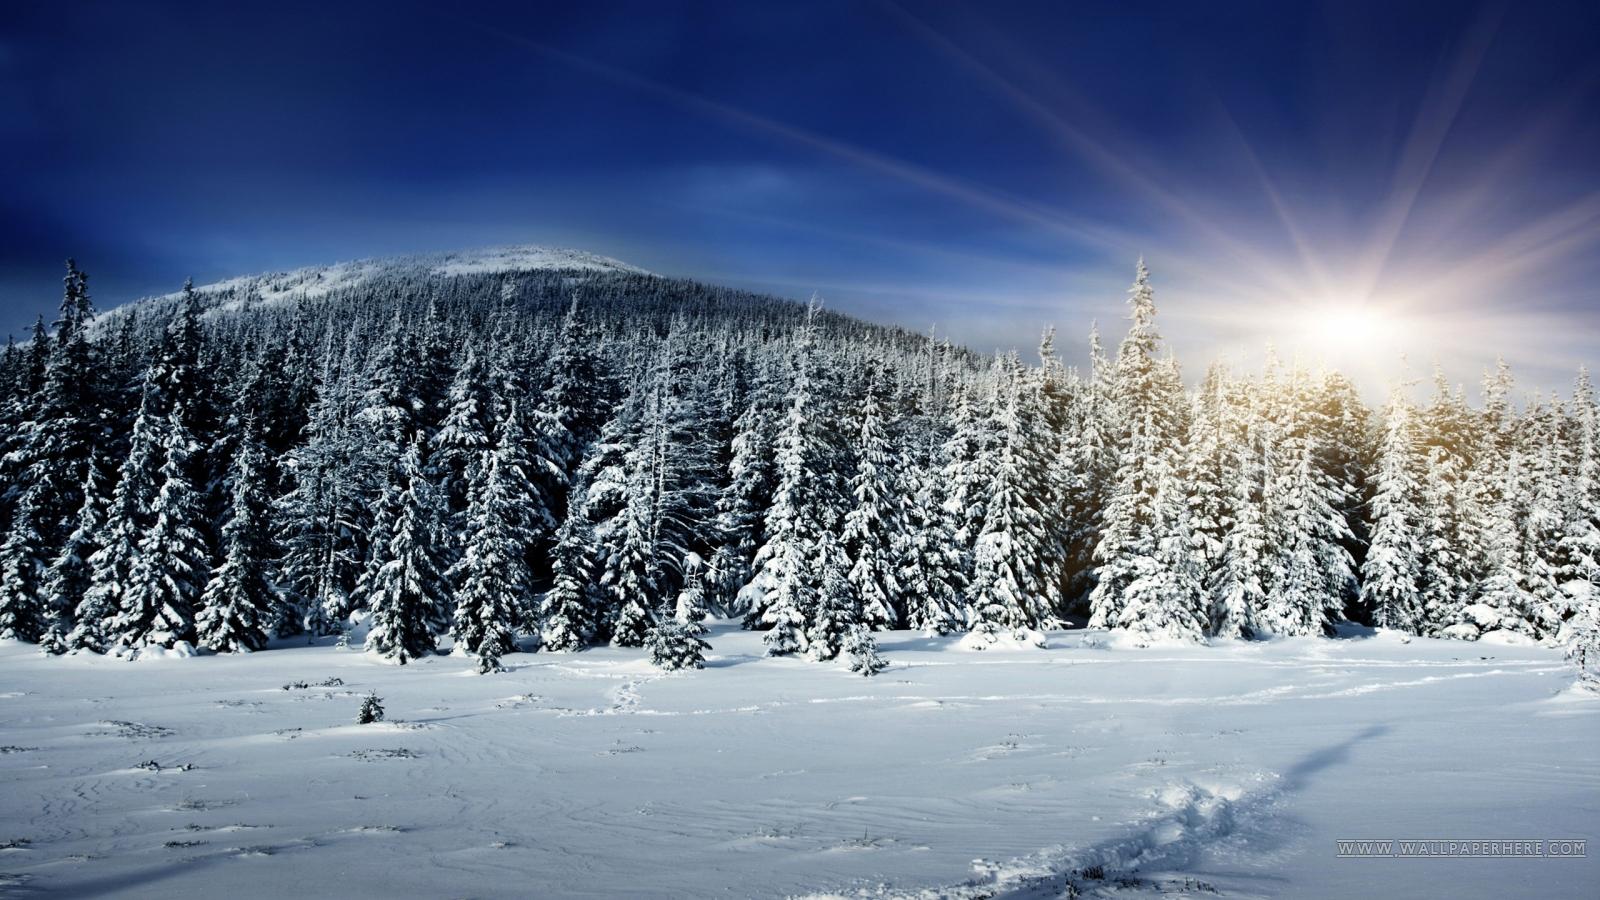 1600x900 hd desktop wallpaper winter - photo #4